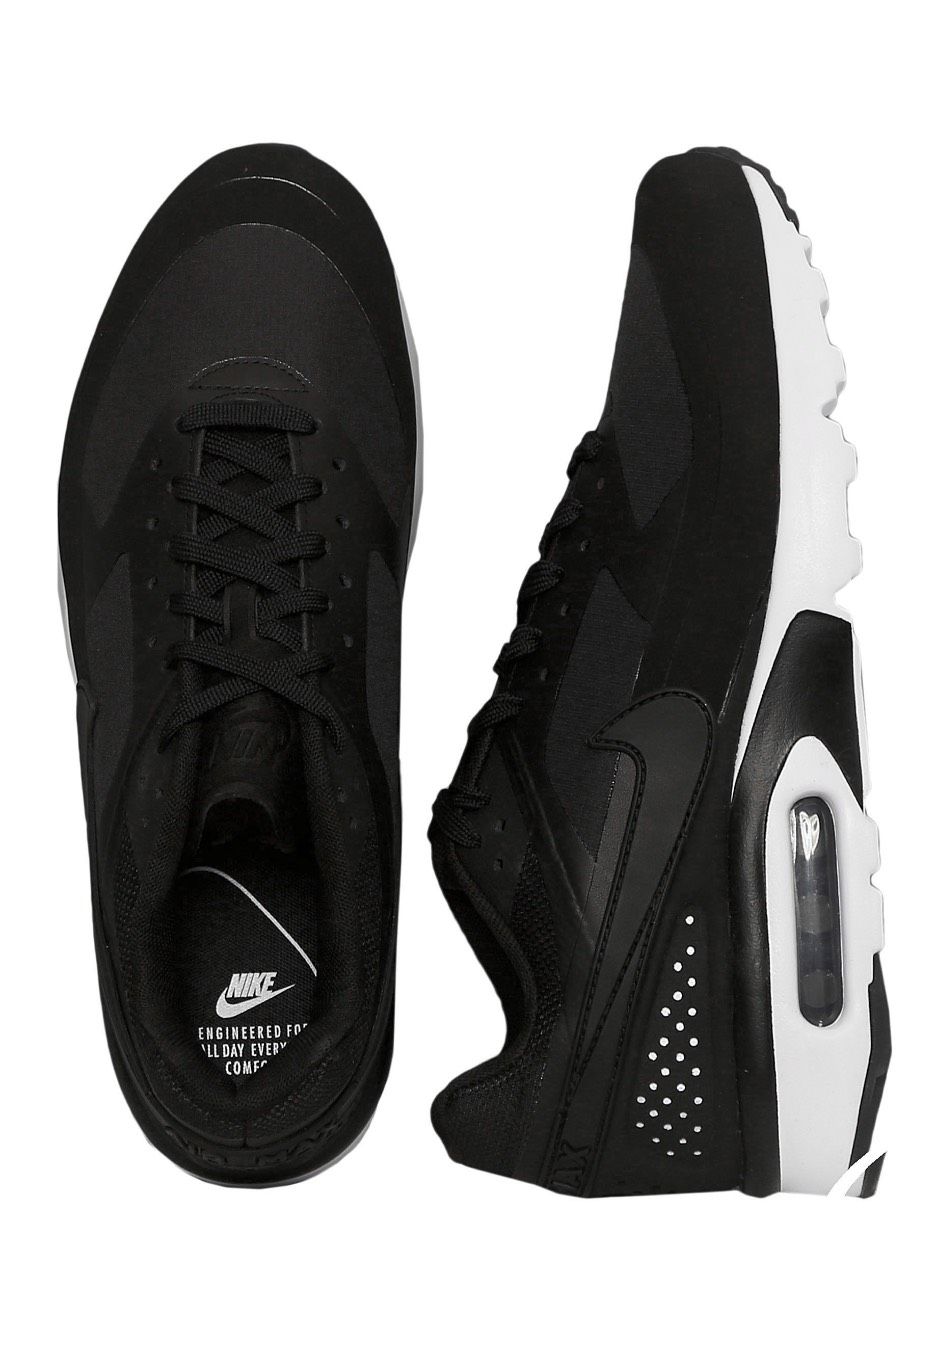 the best attitude d1308 80b1b Nike - Air Max BW Ultra Black Black Black White - Shoes - Impericon.com US